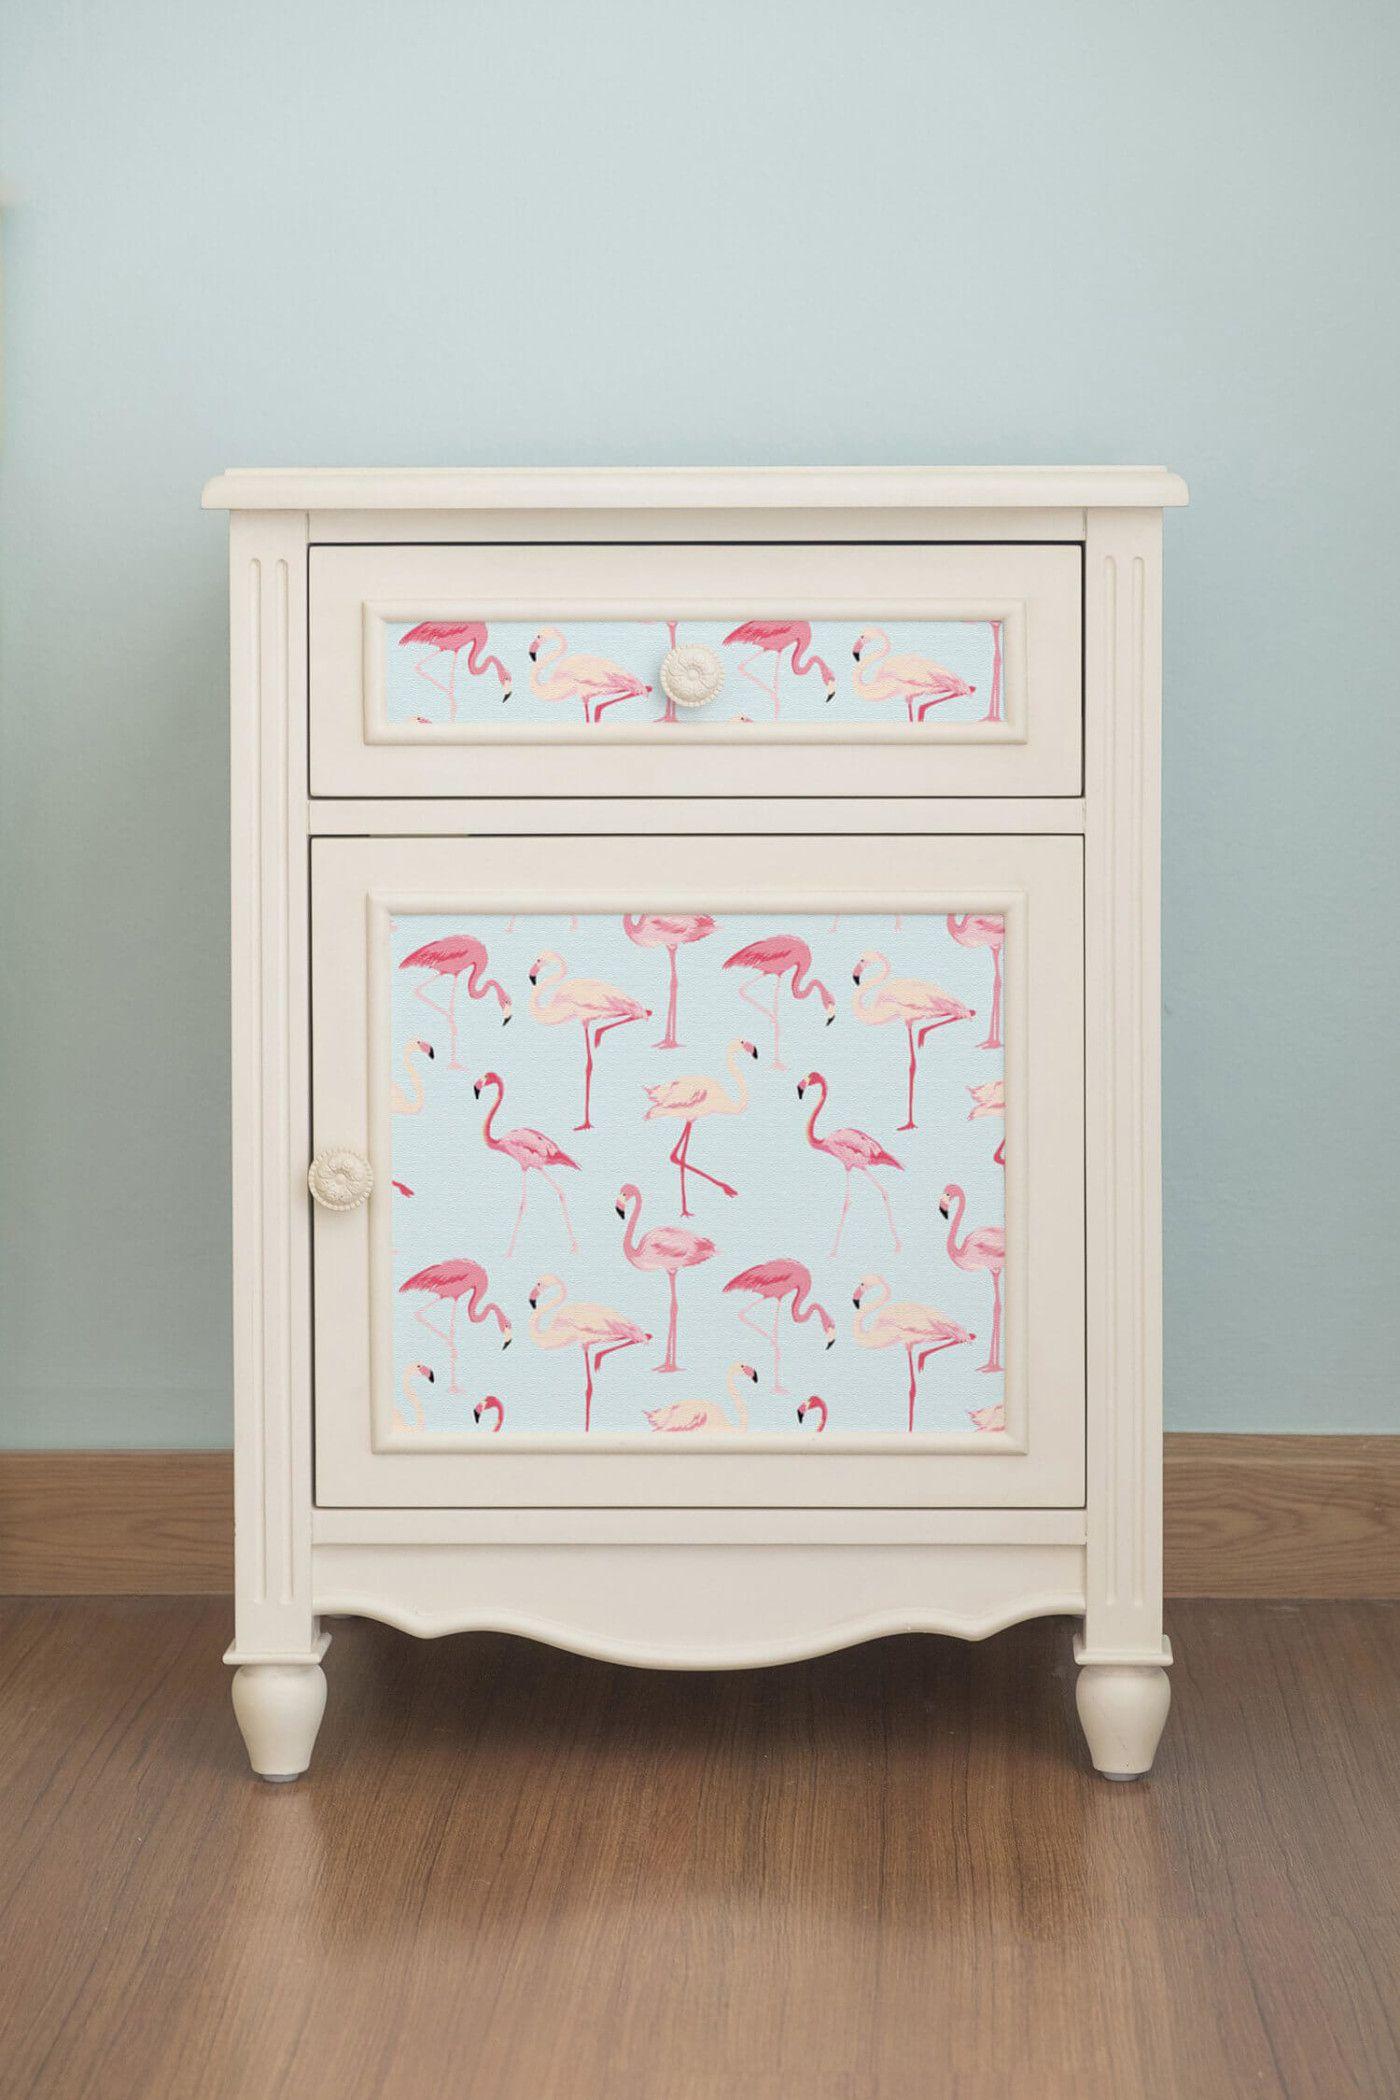 7 Unexpected Ways To Use Removable Wallpaper Murals Wallpaper Wallpaper Furniture New Bathroom Wallpaper Pink Flamingo Wallpaper